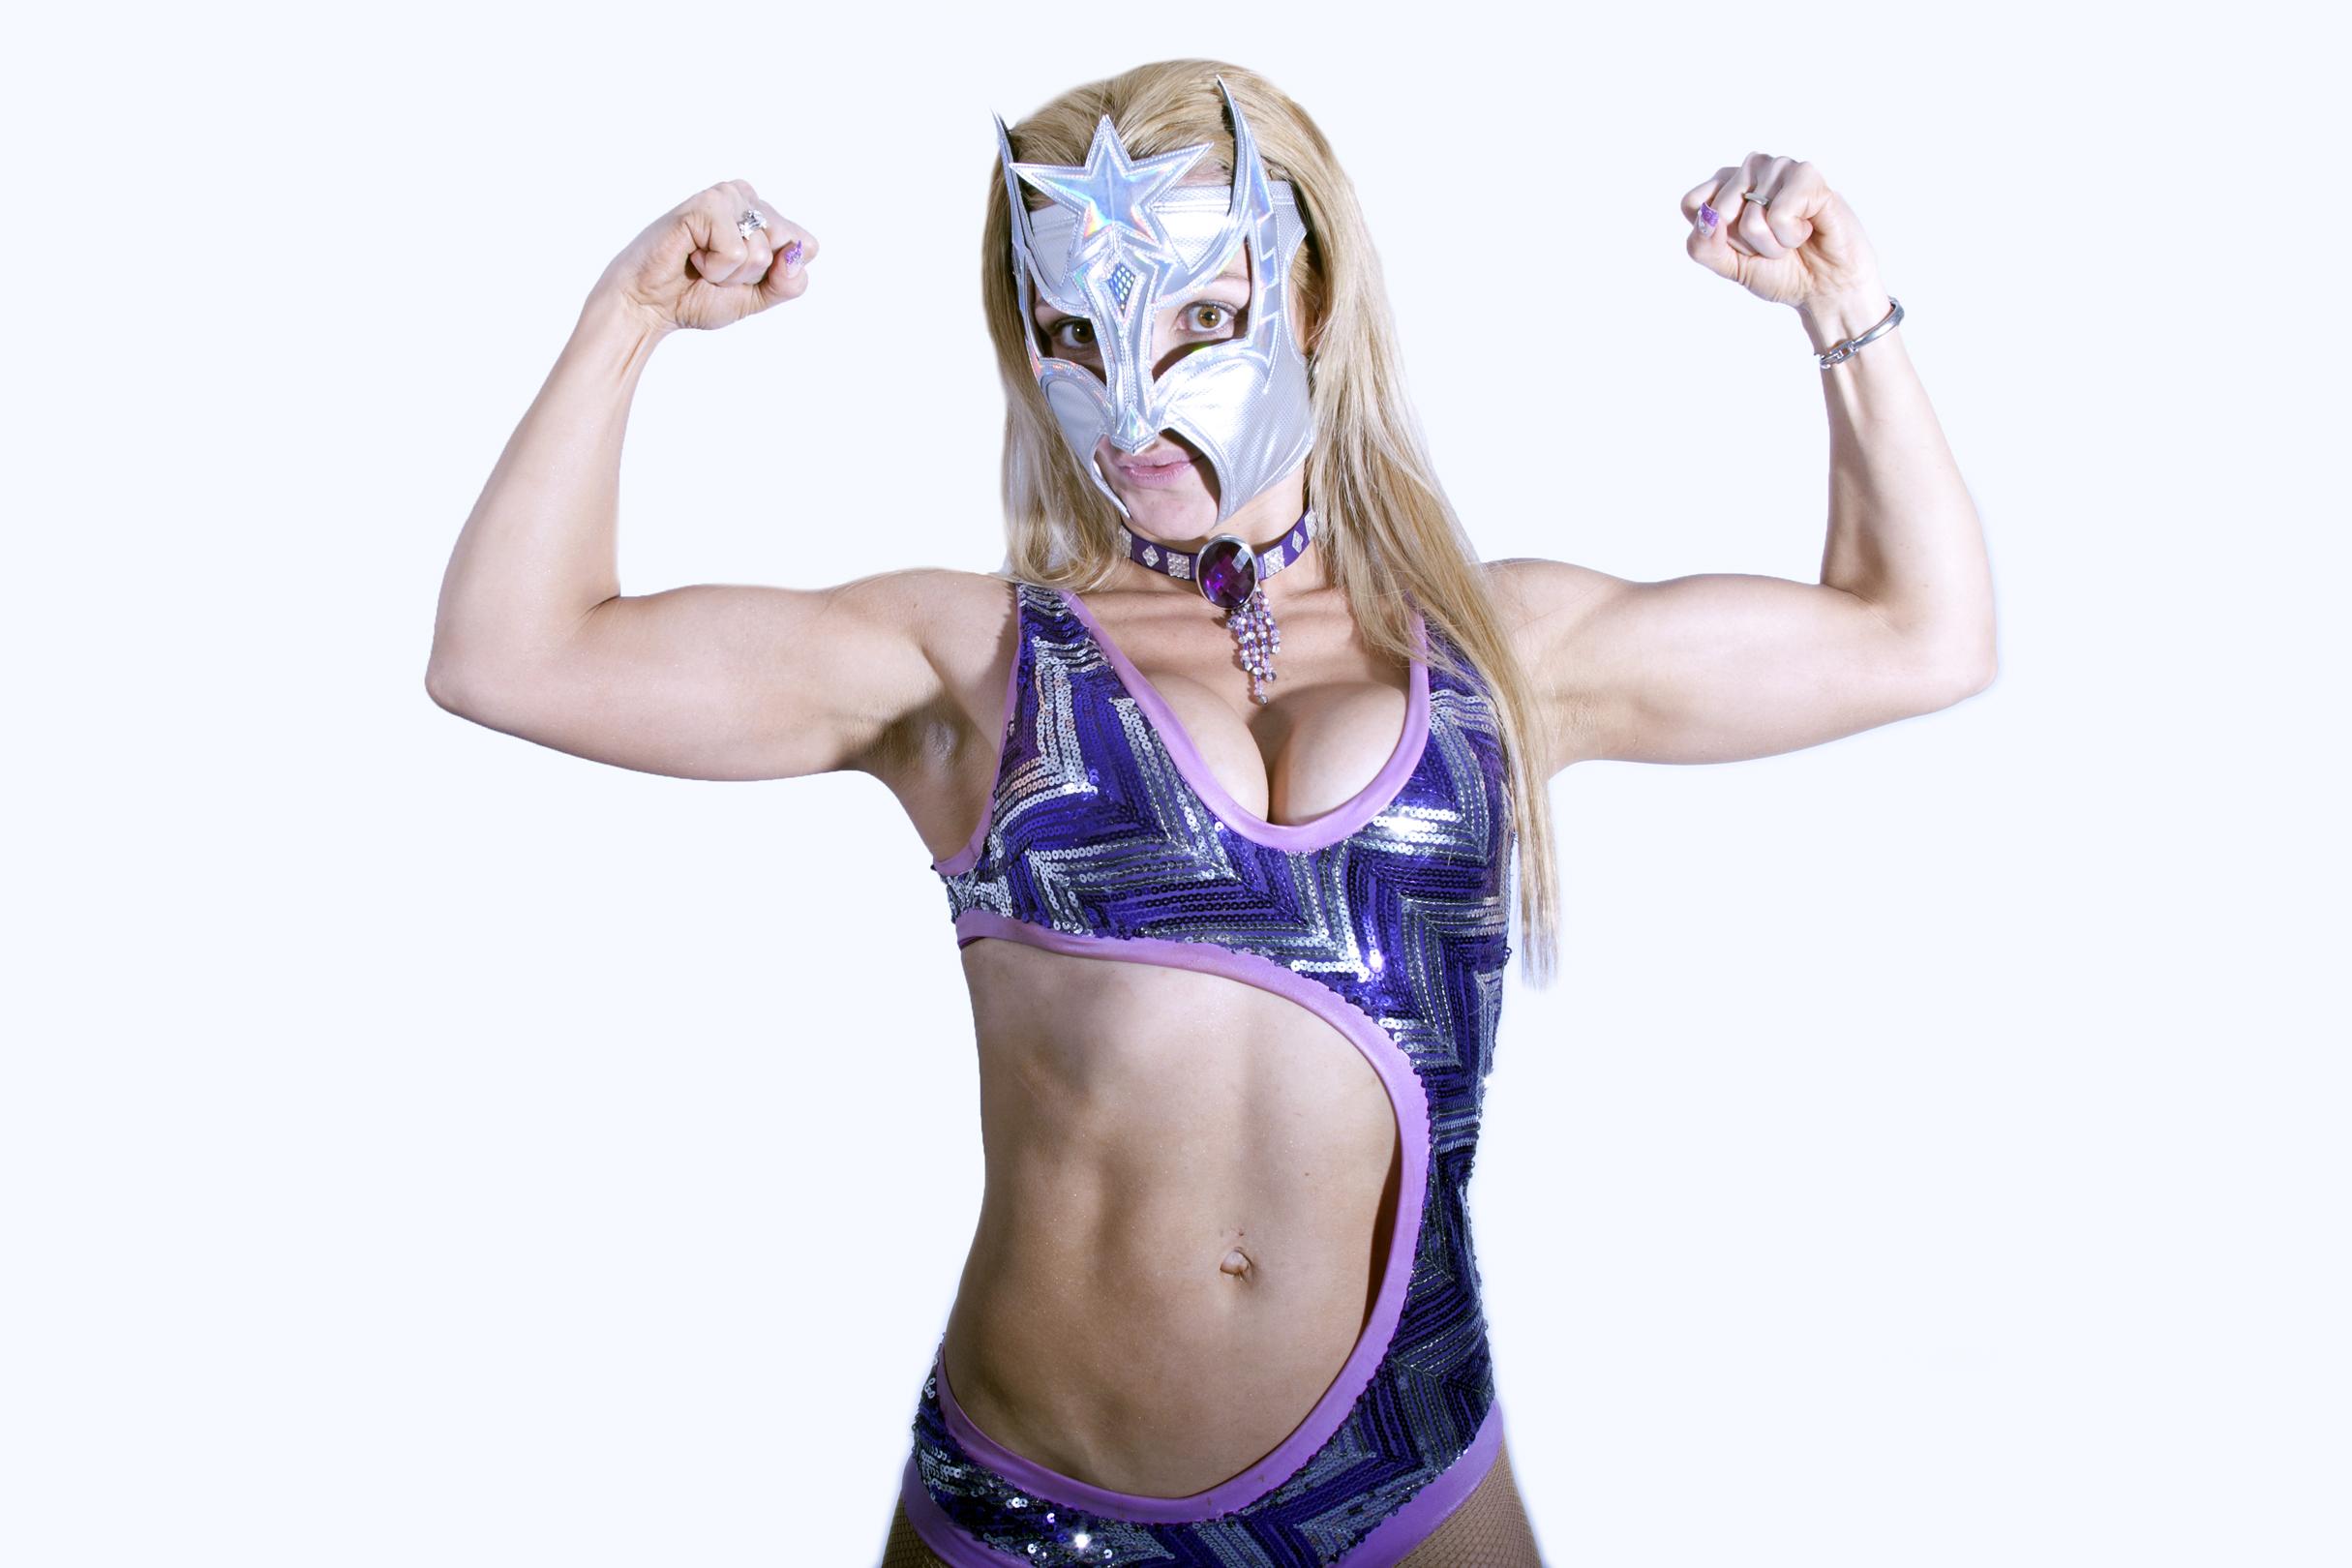 Triple A Reina de Reinas Sexy Star despoja AAA Rosemary